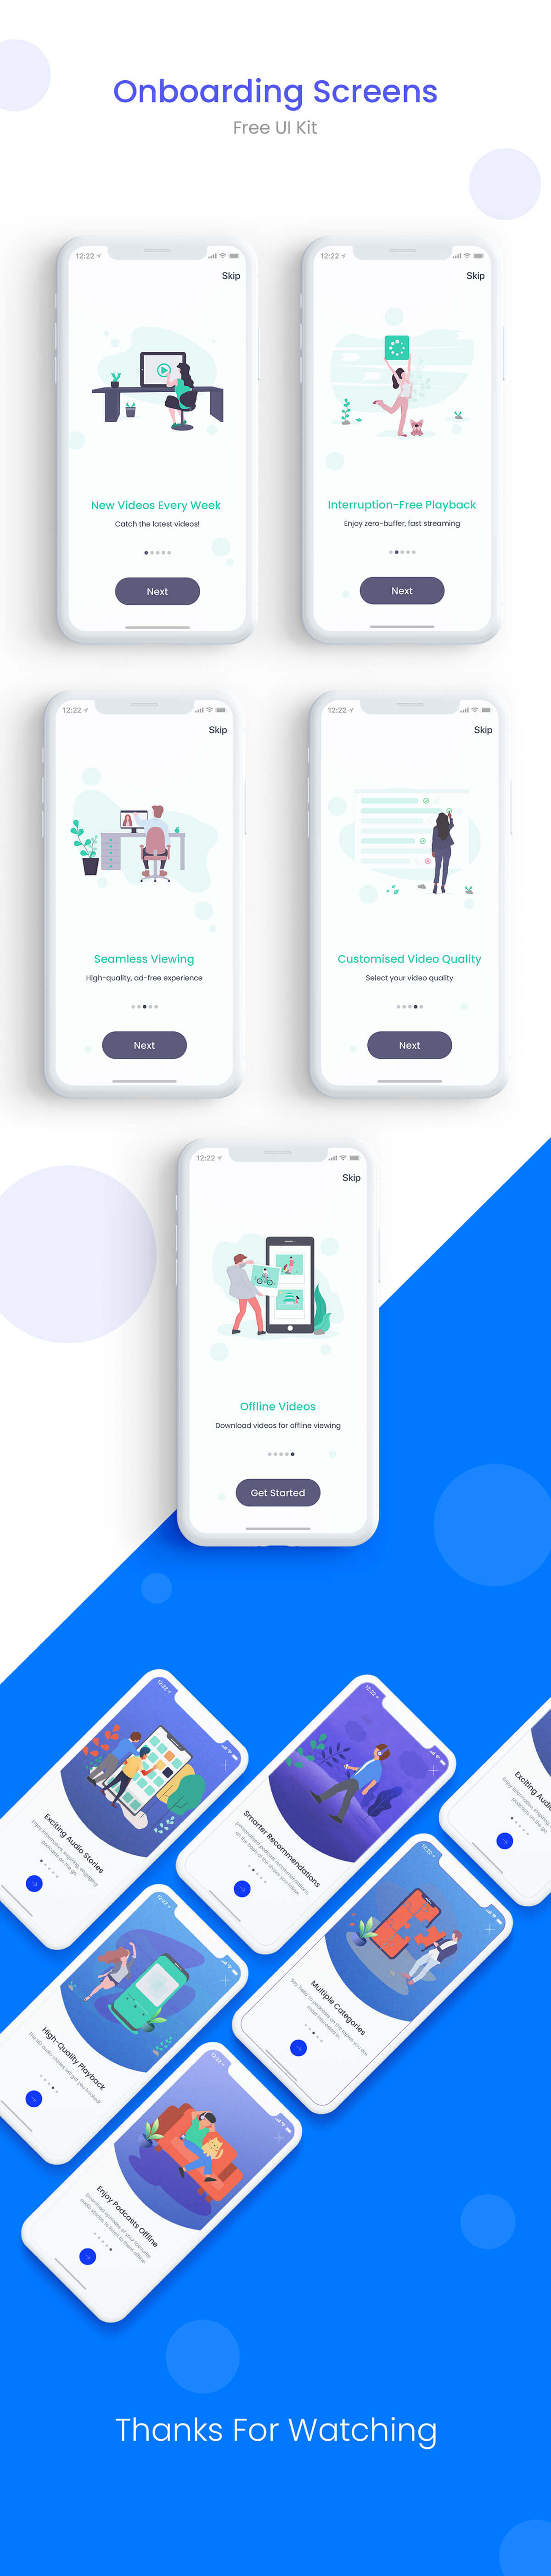 Free App Onboarding Walkthrough Screens Templates